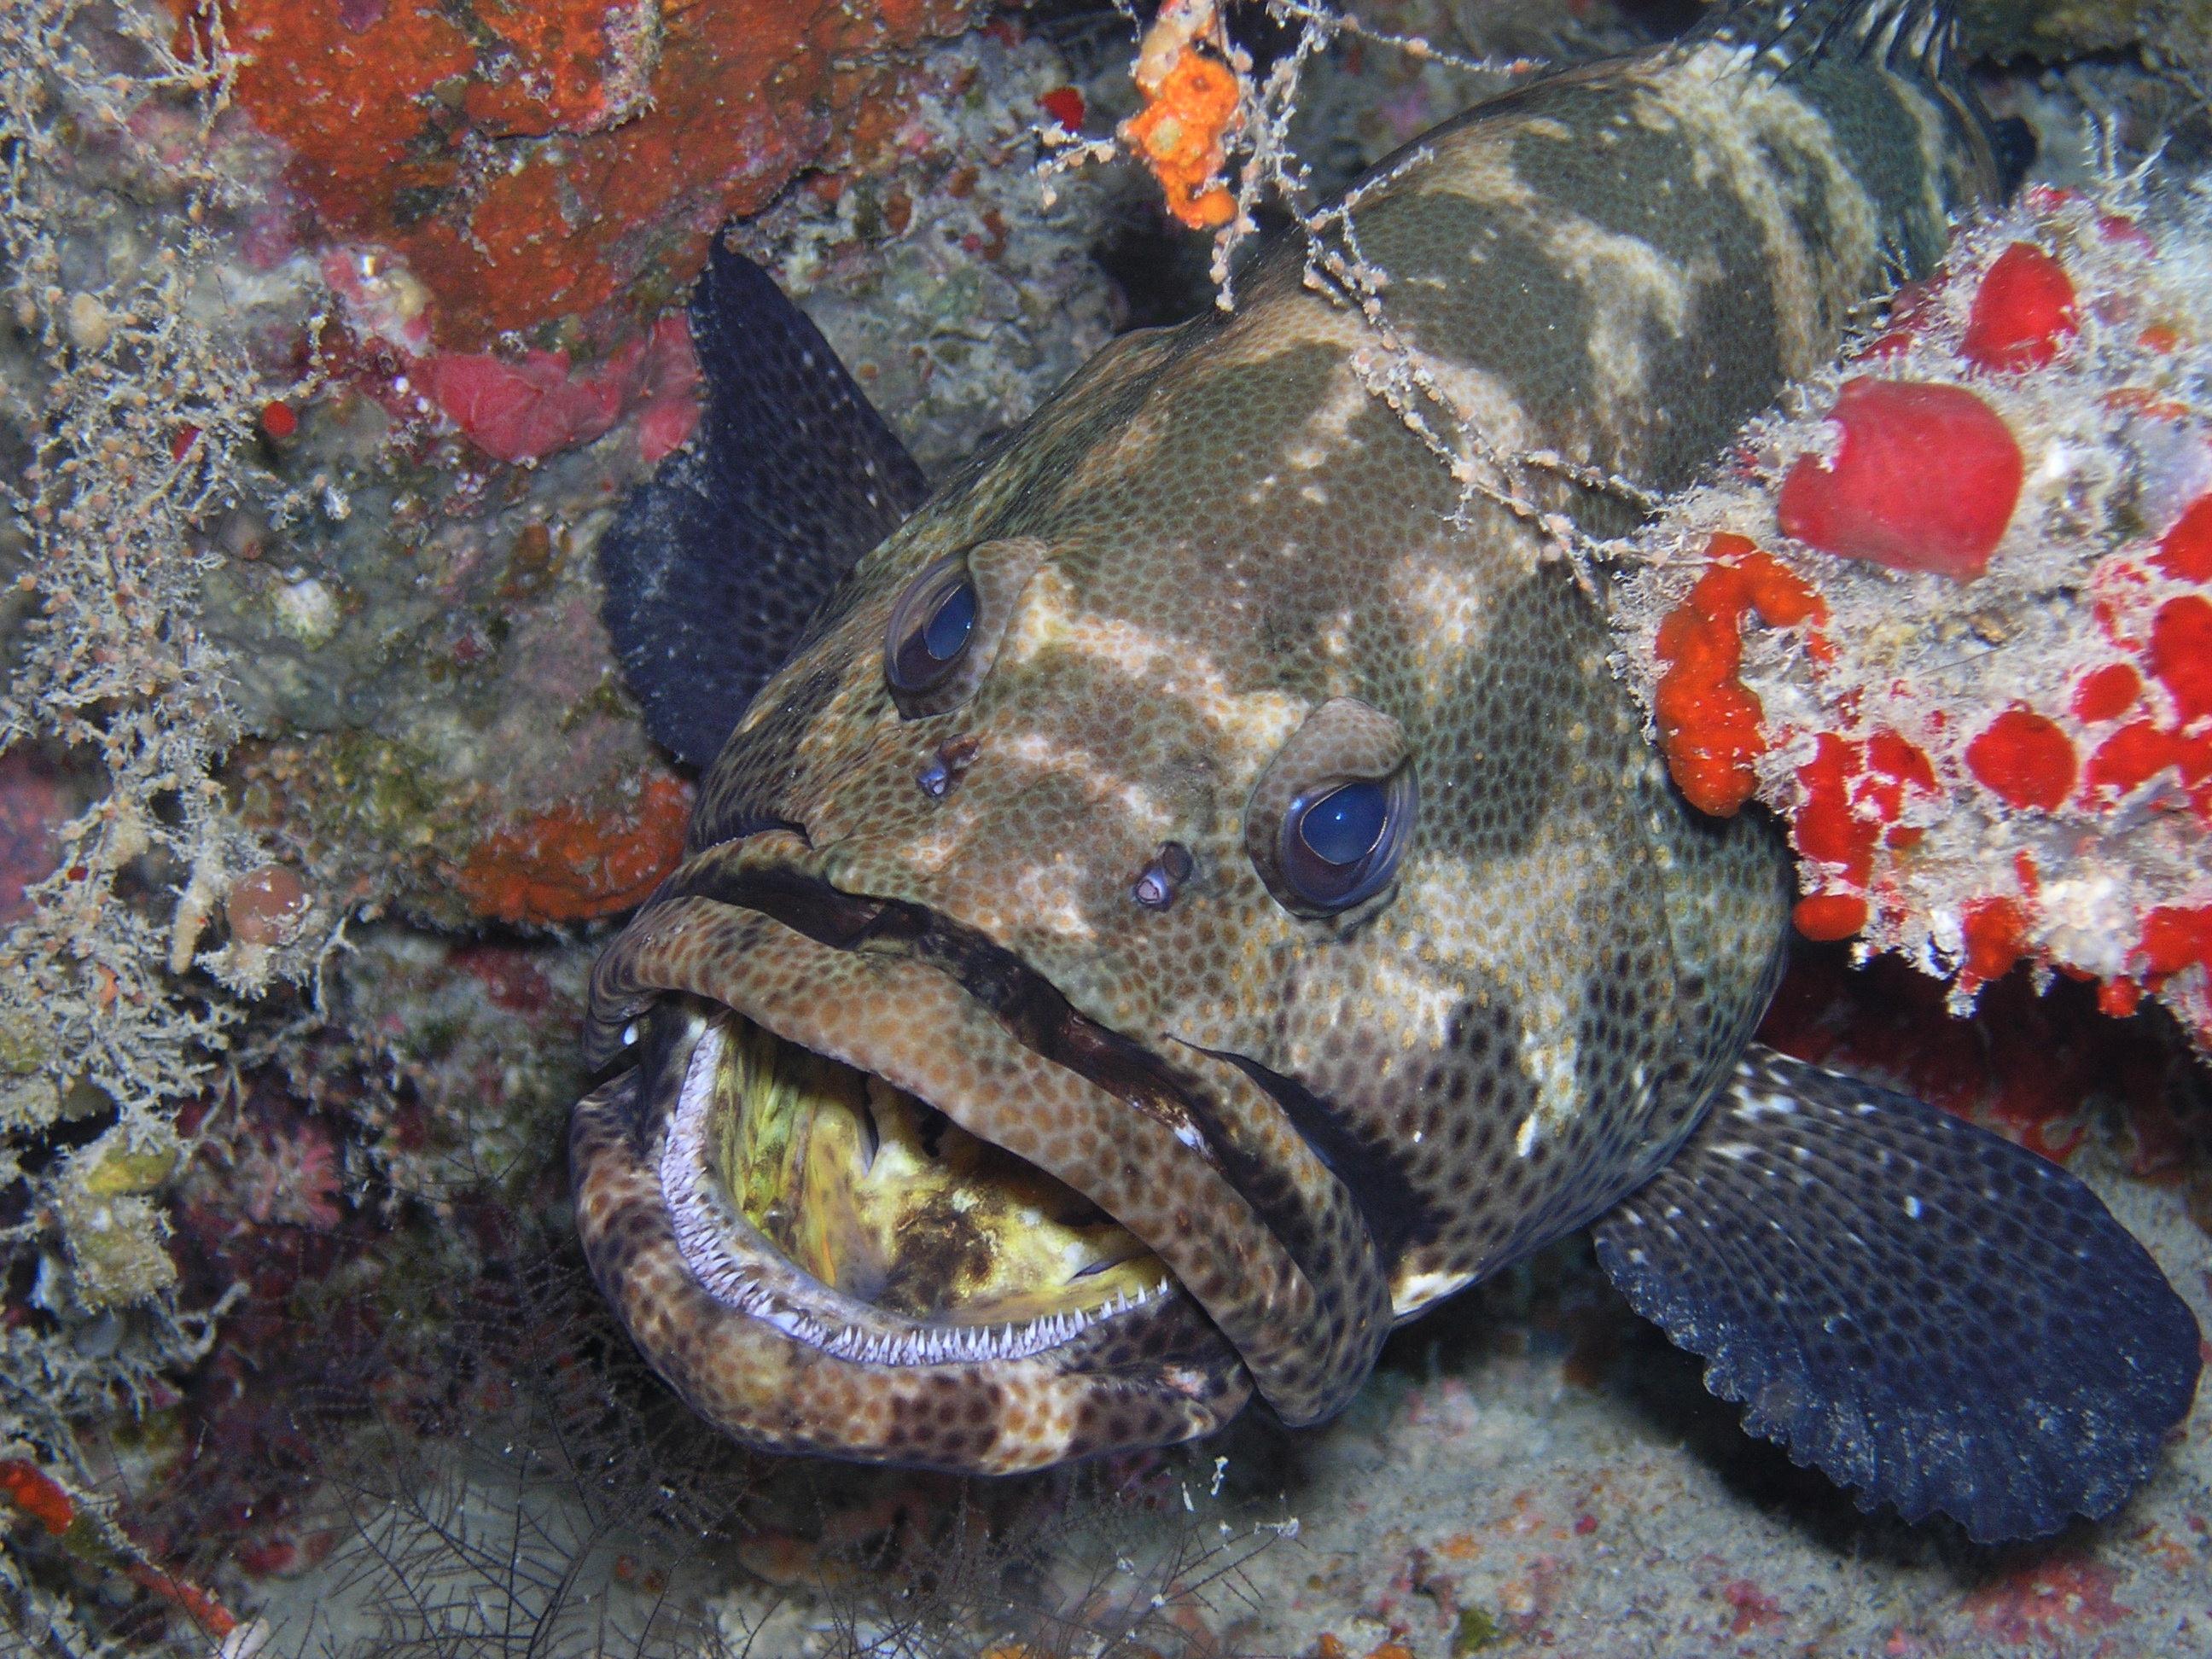 Park Hyatt Maldives Diving and Snorkeling - Grouper